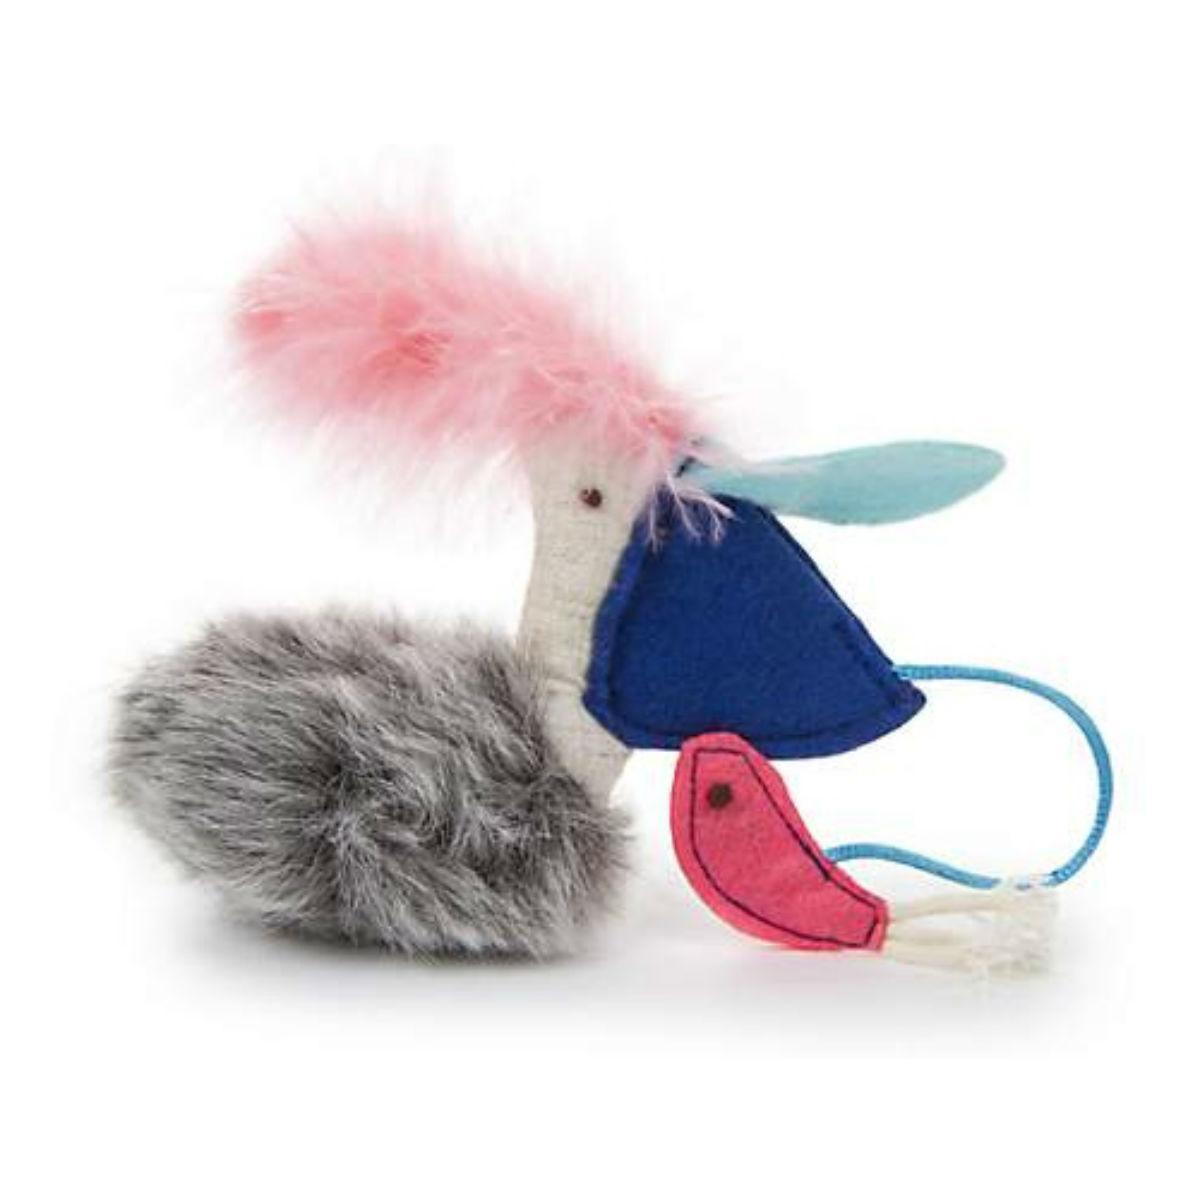 PetLinks Sea Hide & Peek Pelican & Fish Catnip Cat Toy